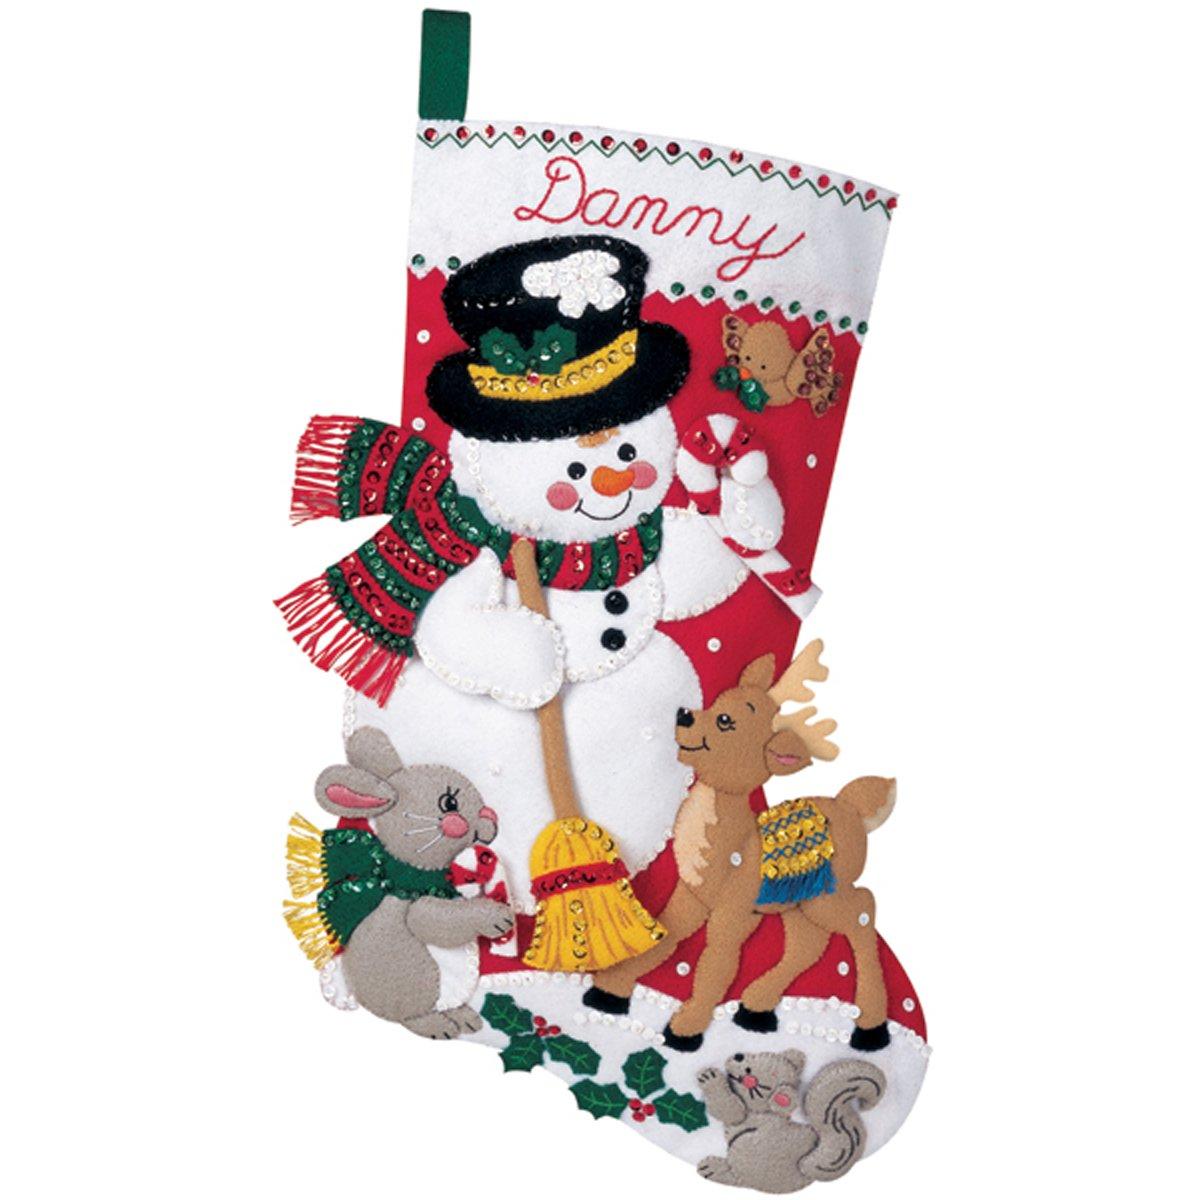 Bucilla Snowman & Friends Stocking Felt Applique Kit 18 Long 84951